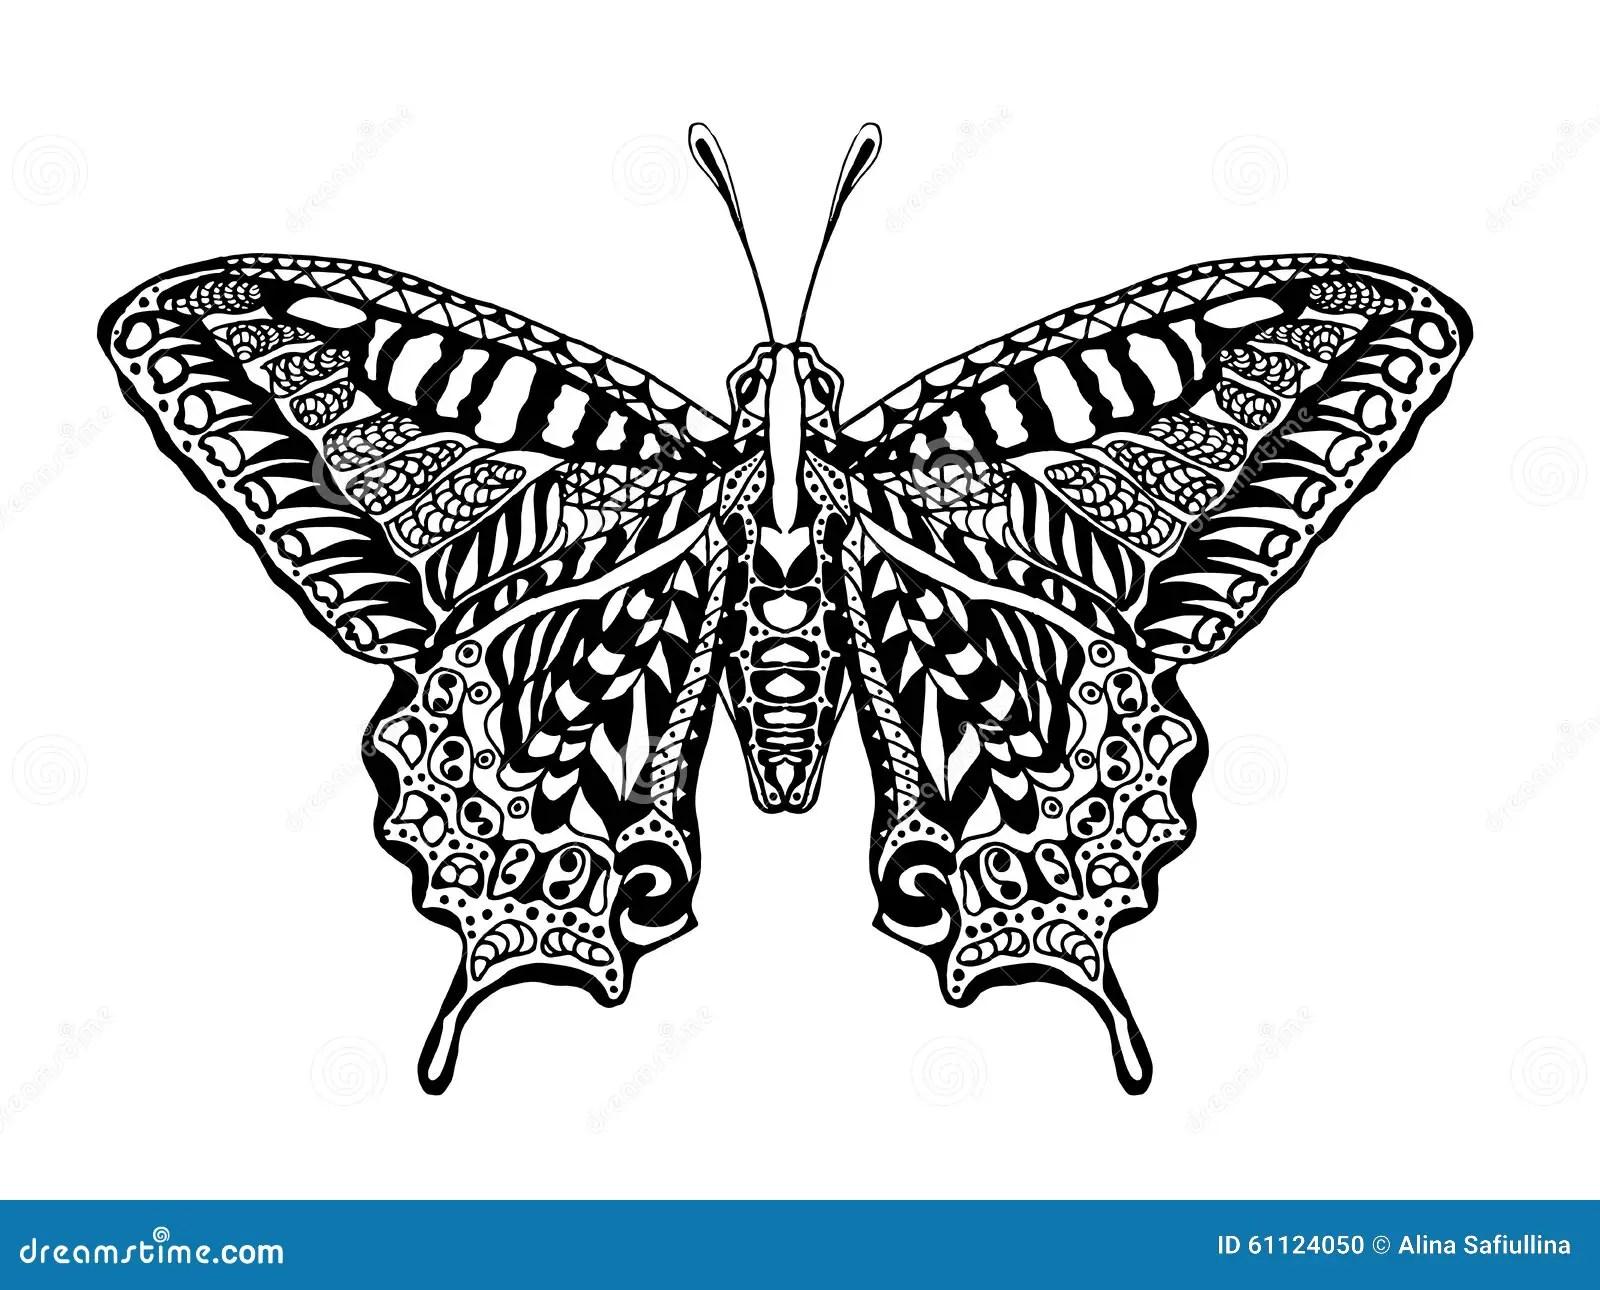 Cute Mandala Wallpaper Zentangle Stylized Butterfly Stock Illustration Image